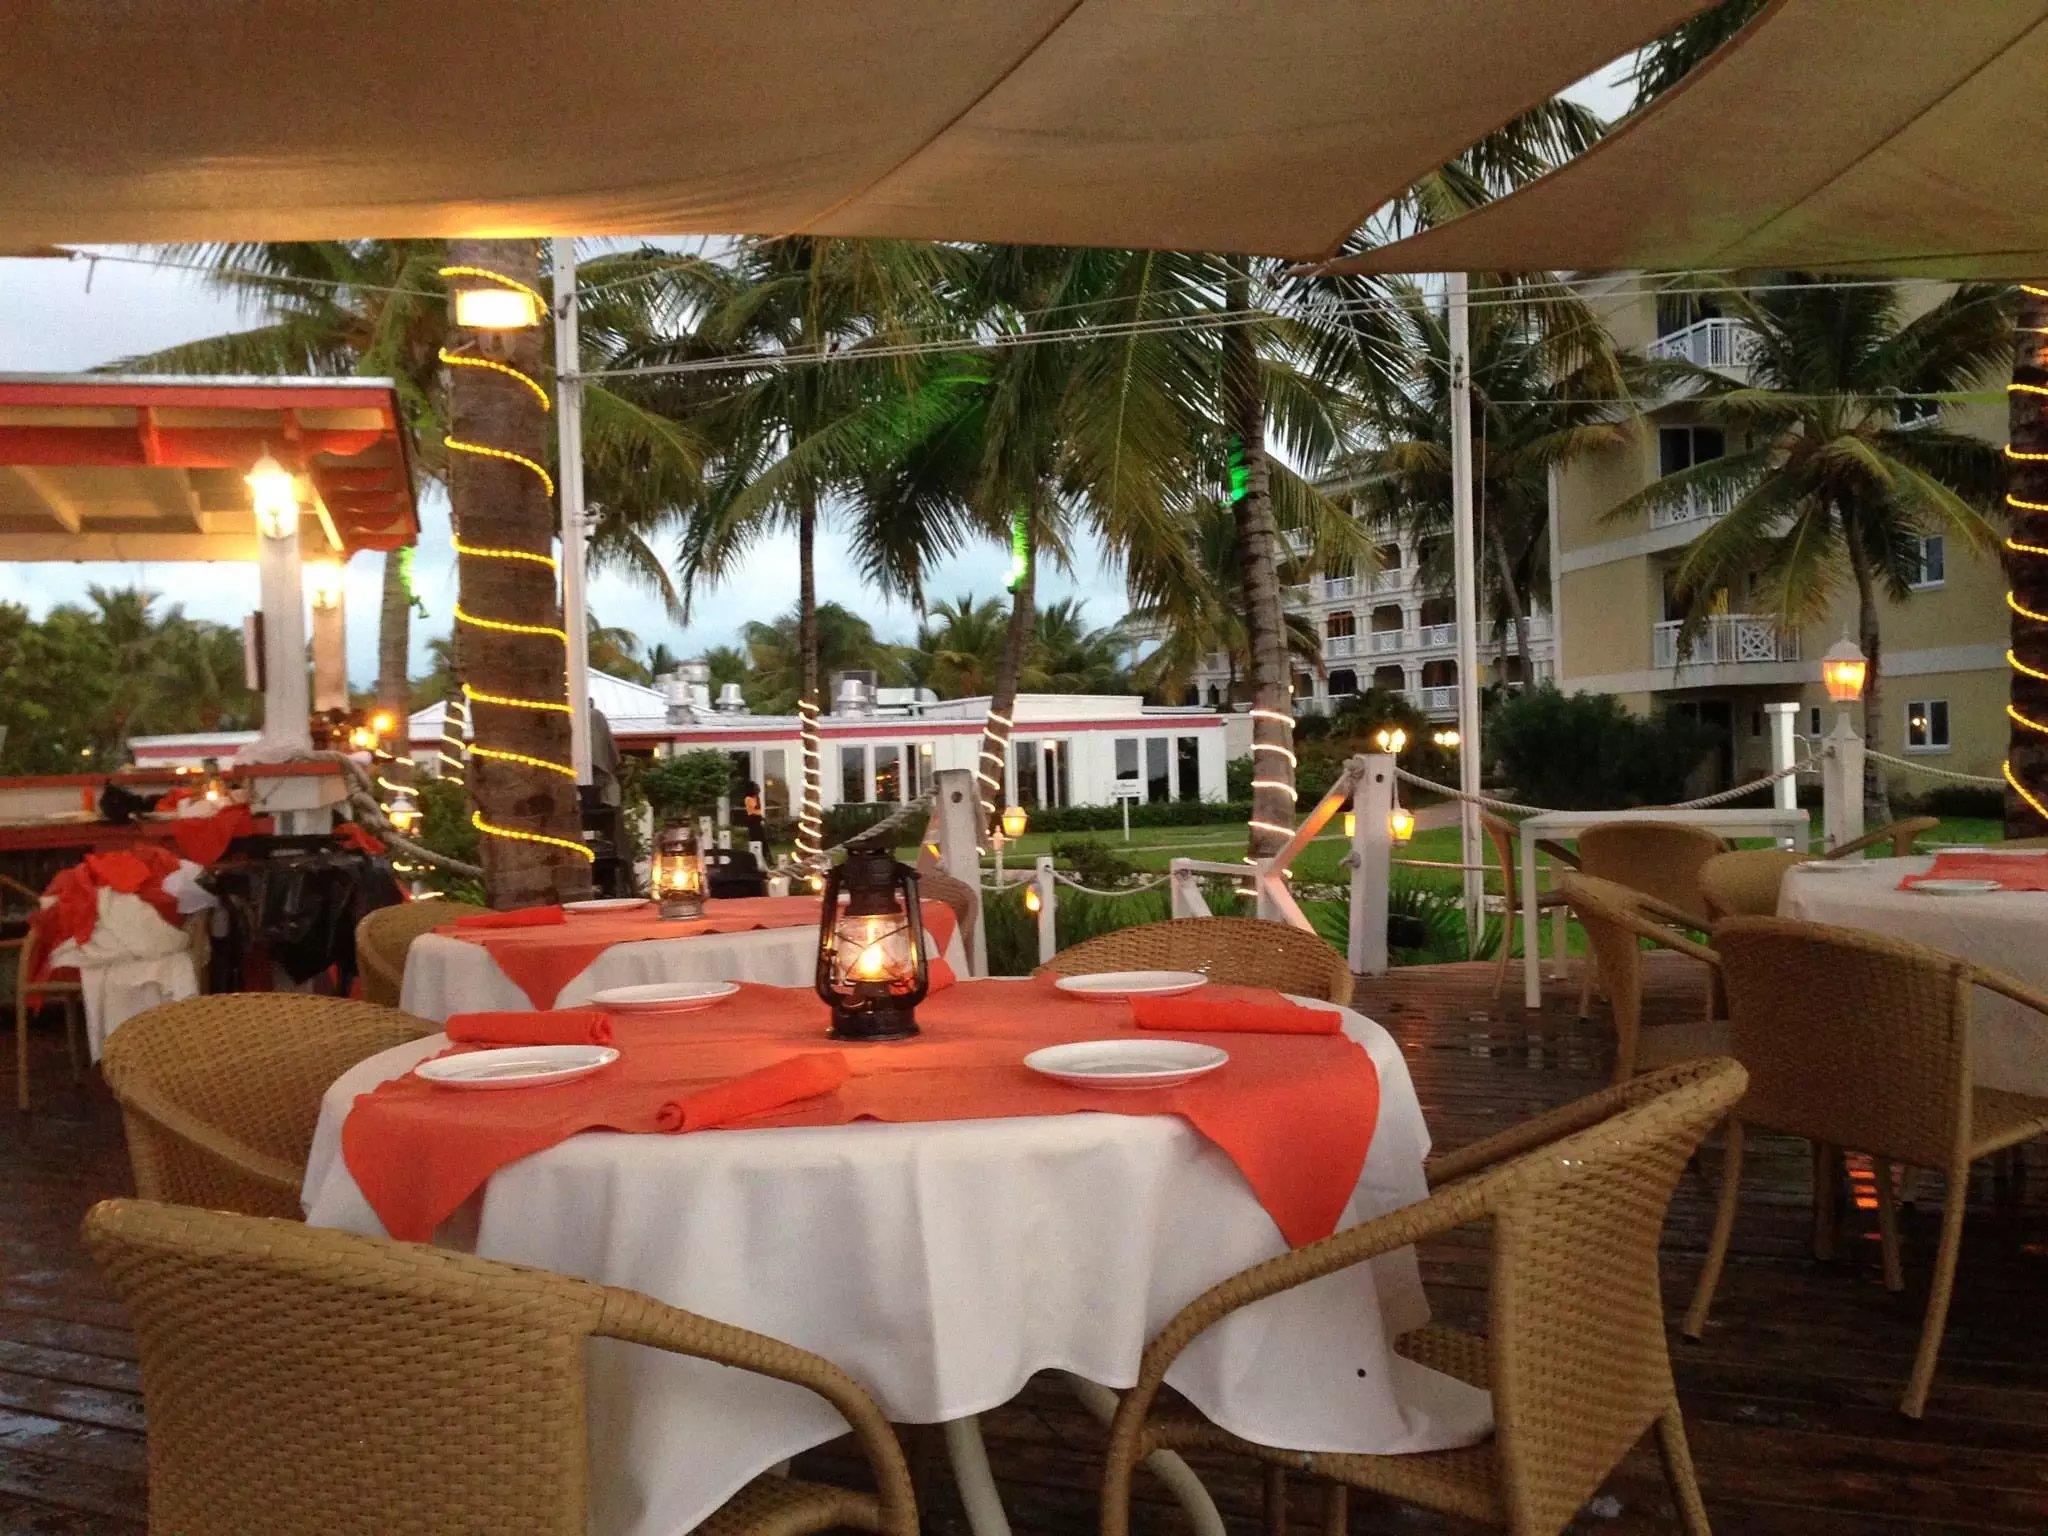 Tented patio seating at Mango Reef Restaurant